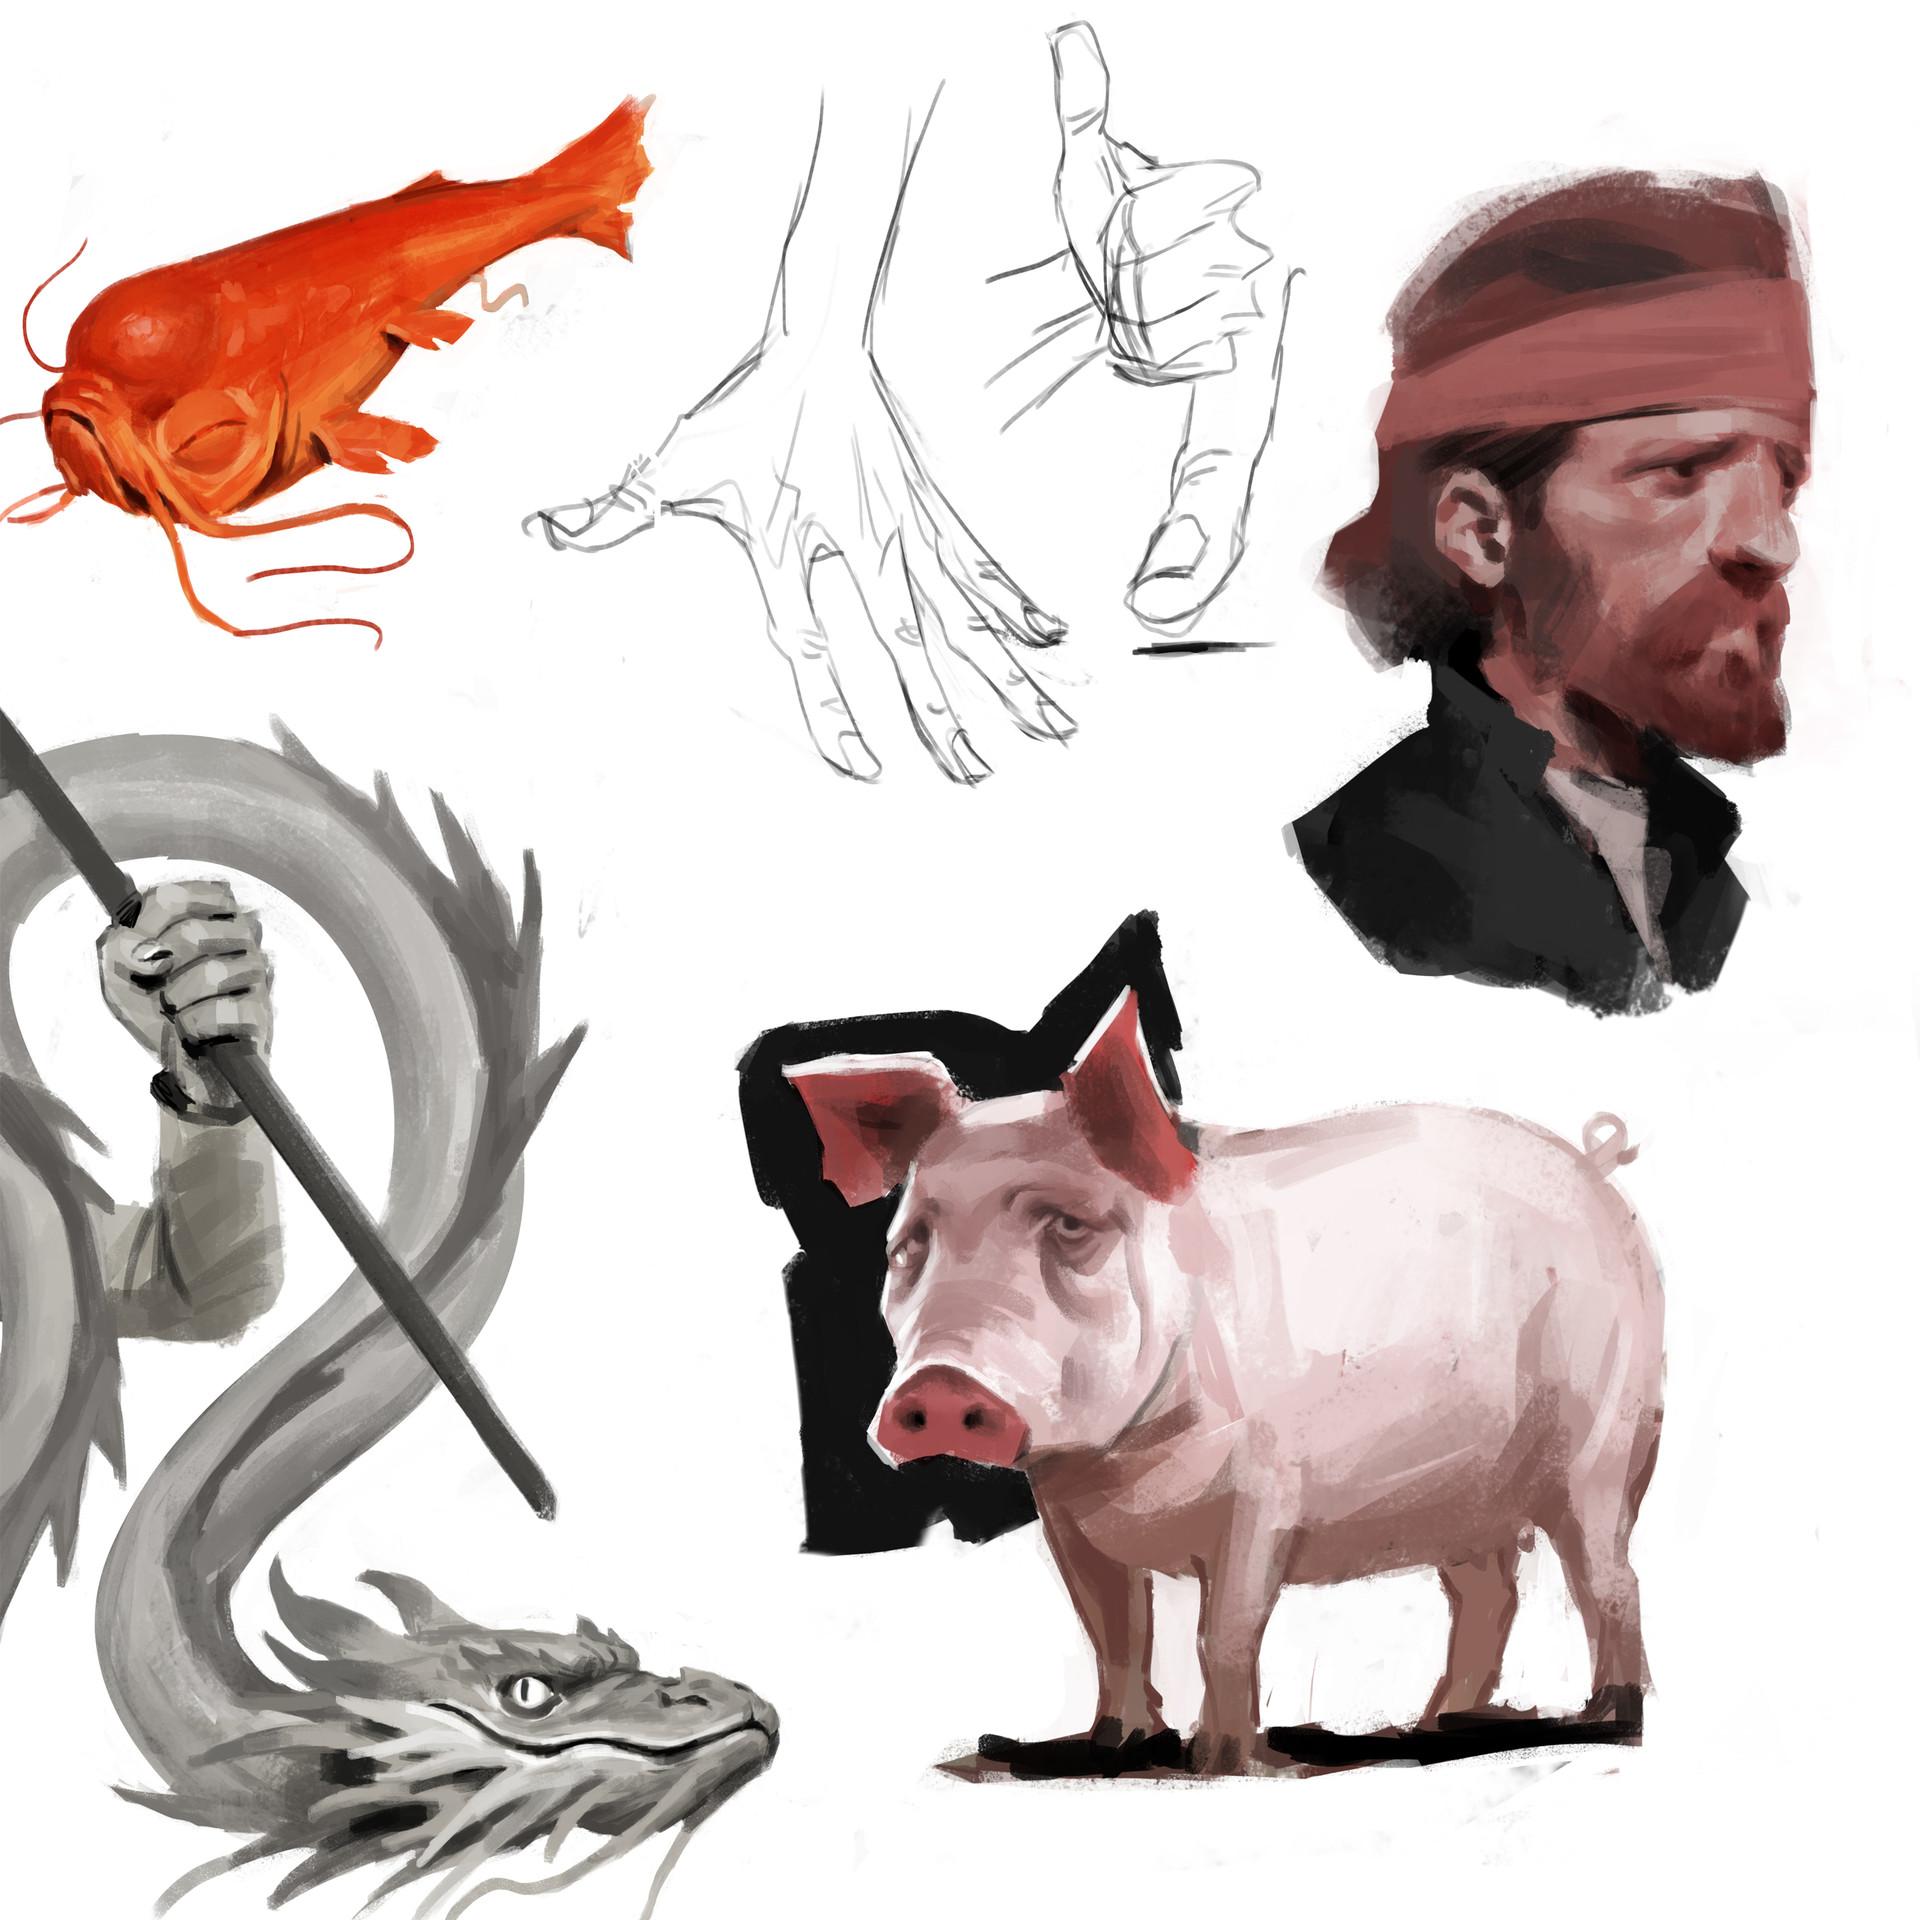 Jens claessens sketchbook5